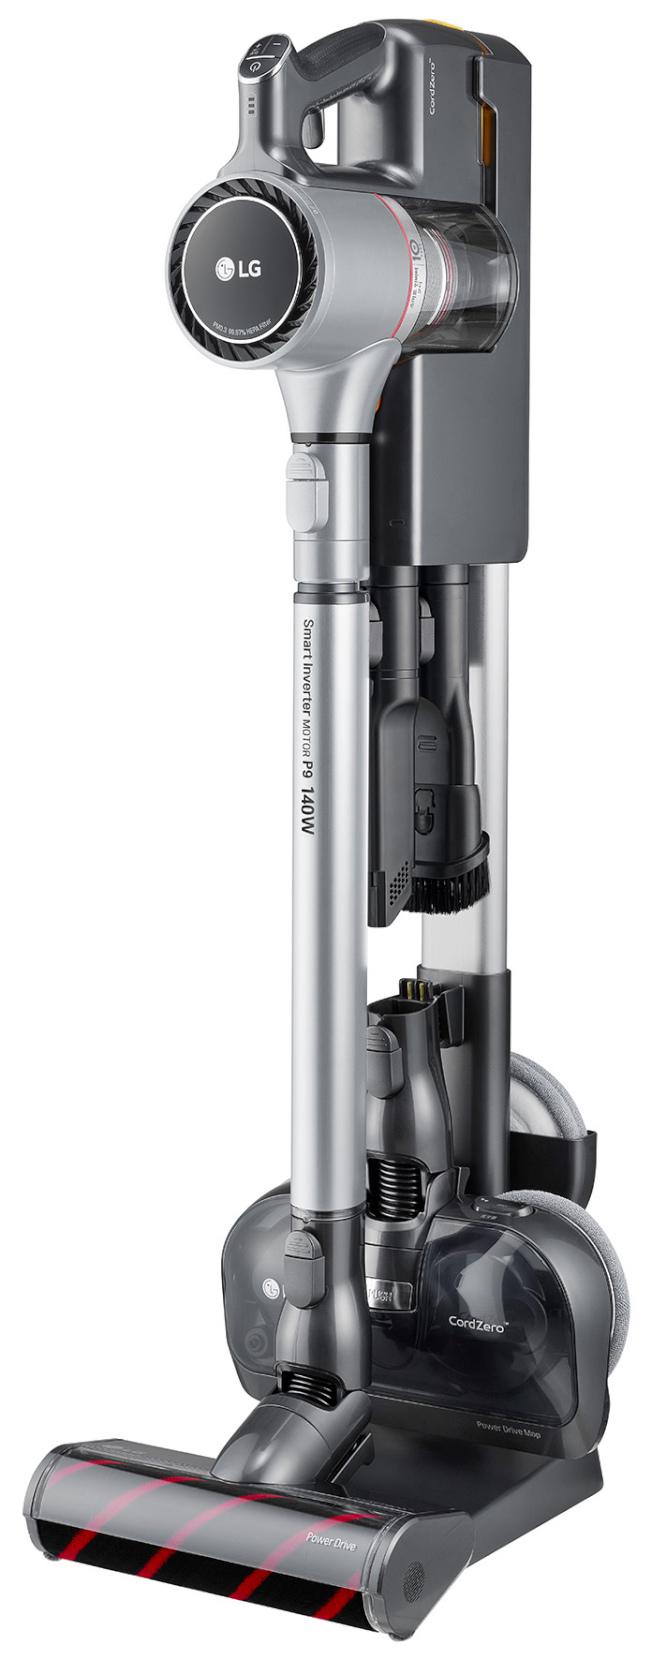 LG手持無線吸塵器濕拖版。(圖:全國電子提供)